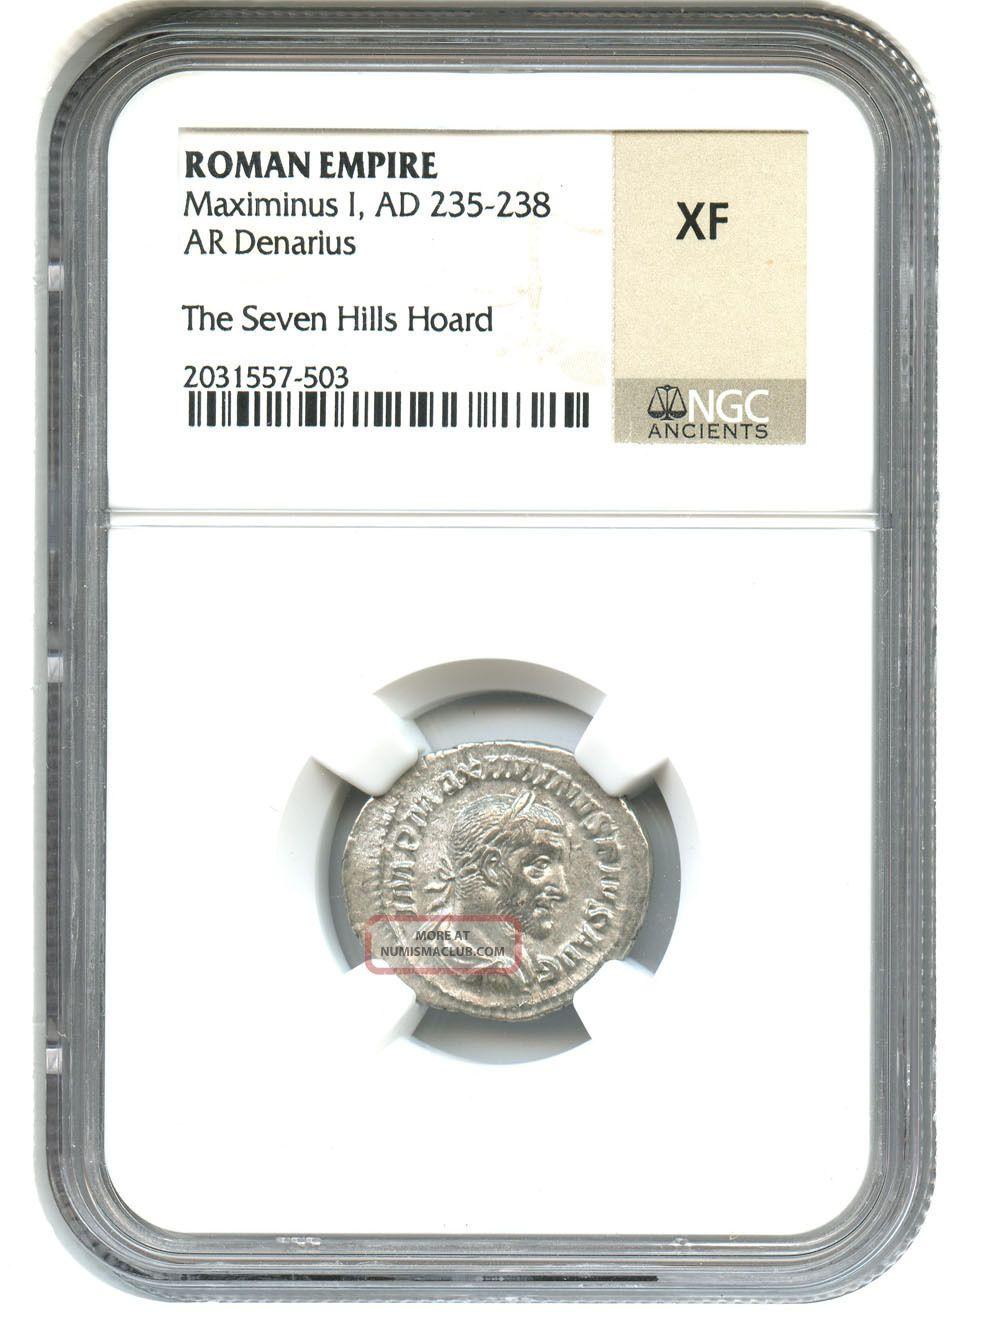 Ad 235 - 238 Maximinus I Ar Denarius Ngc Xf (roman Empire) Coins: Ancient photo